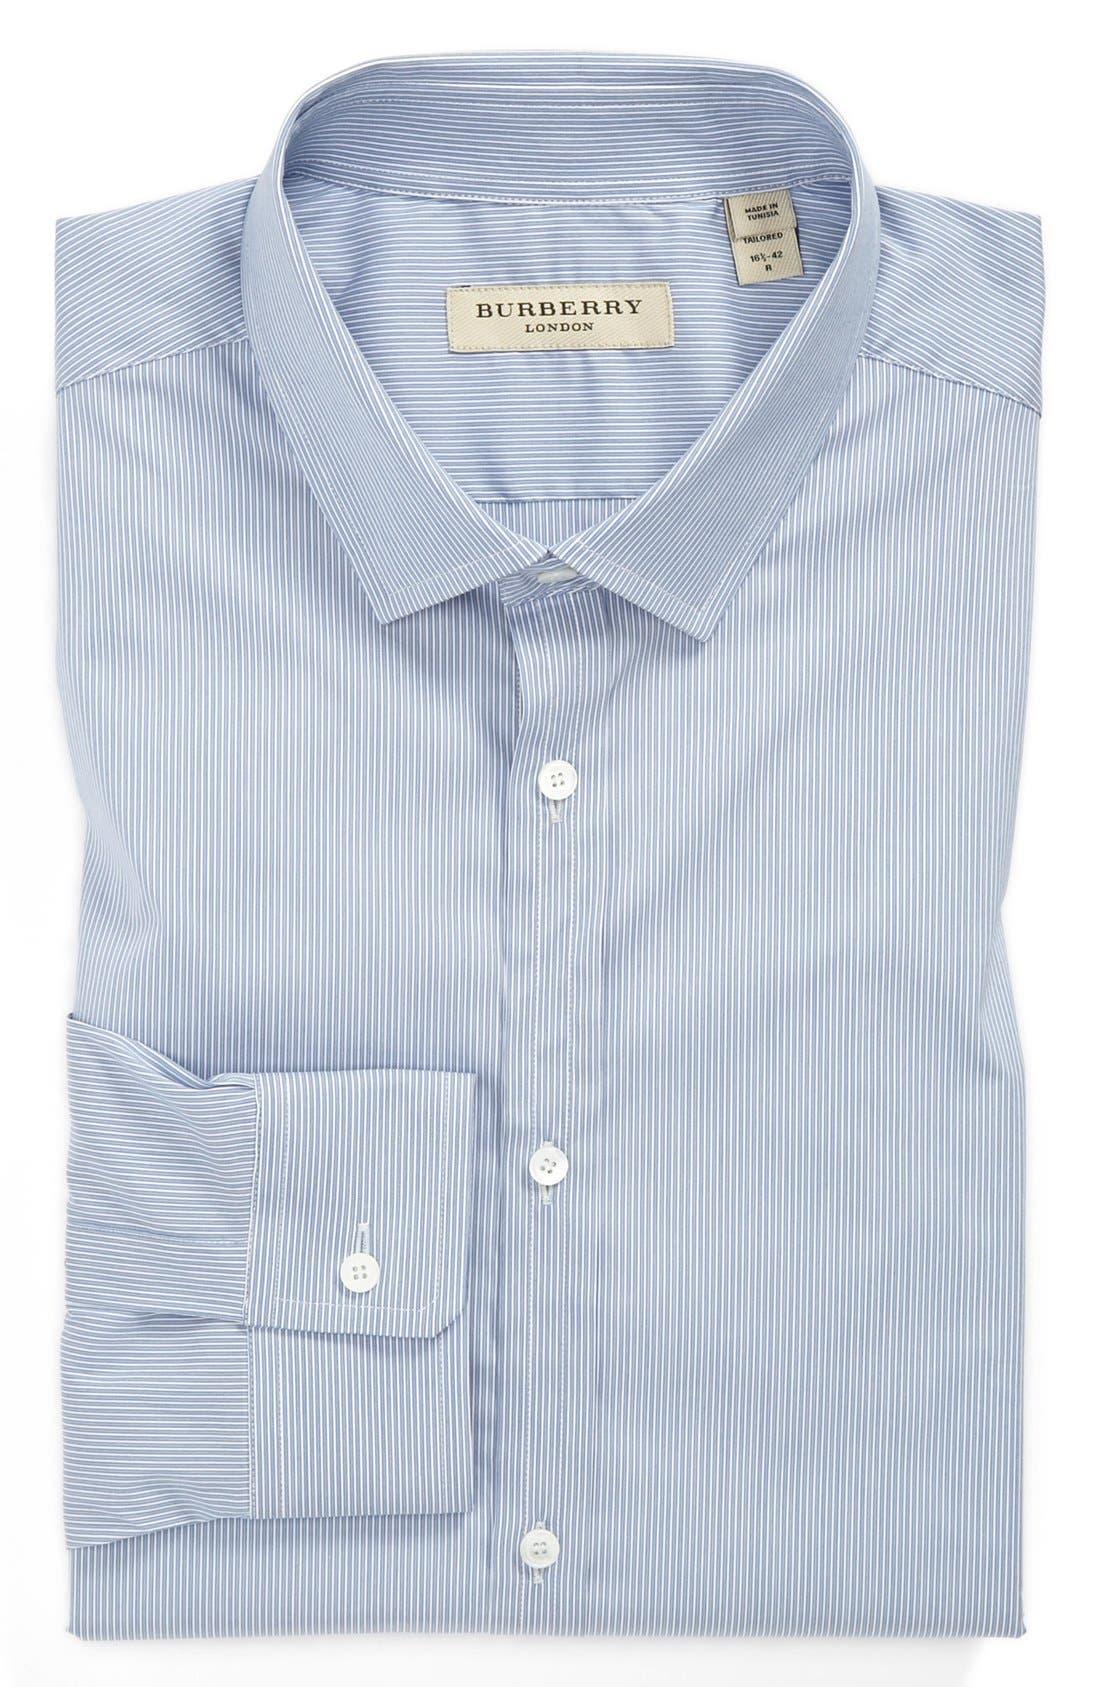 BURBERRY,                             London Stripe Tailored Fit Dress Shirt,                             Main thumbnail 1, color,                             426